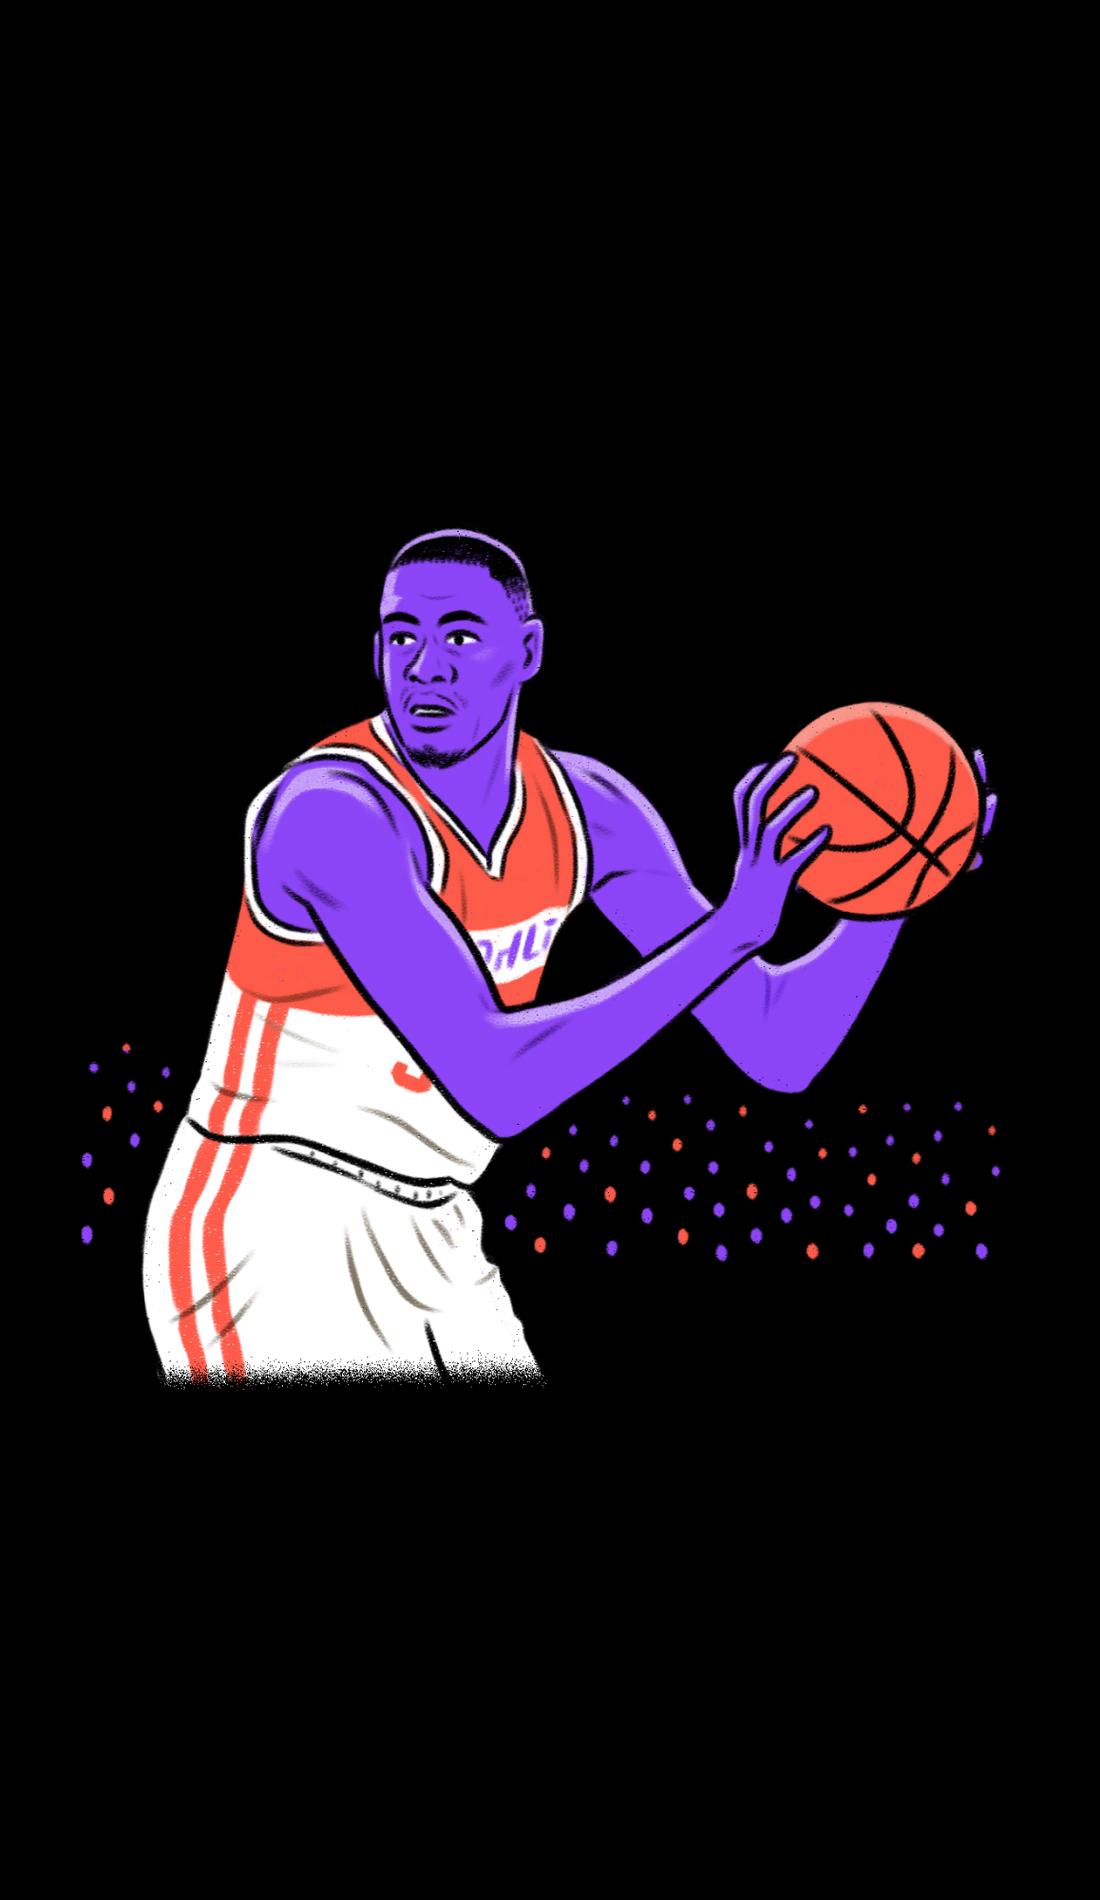 A Texas A&M Aggies Basketball live event